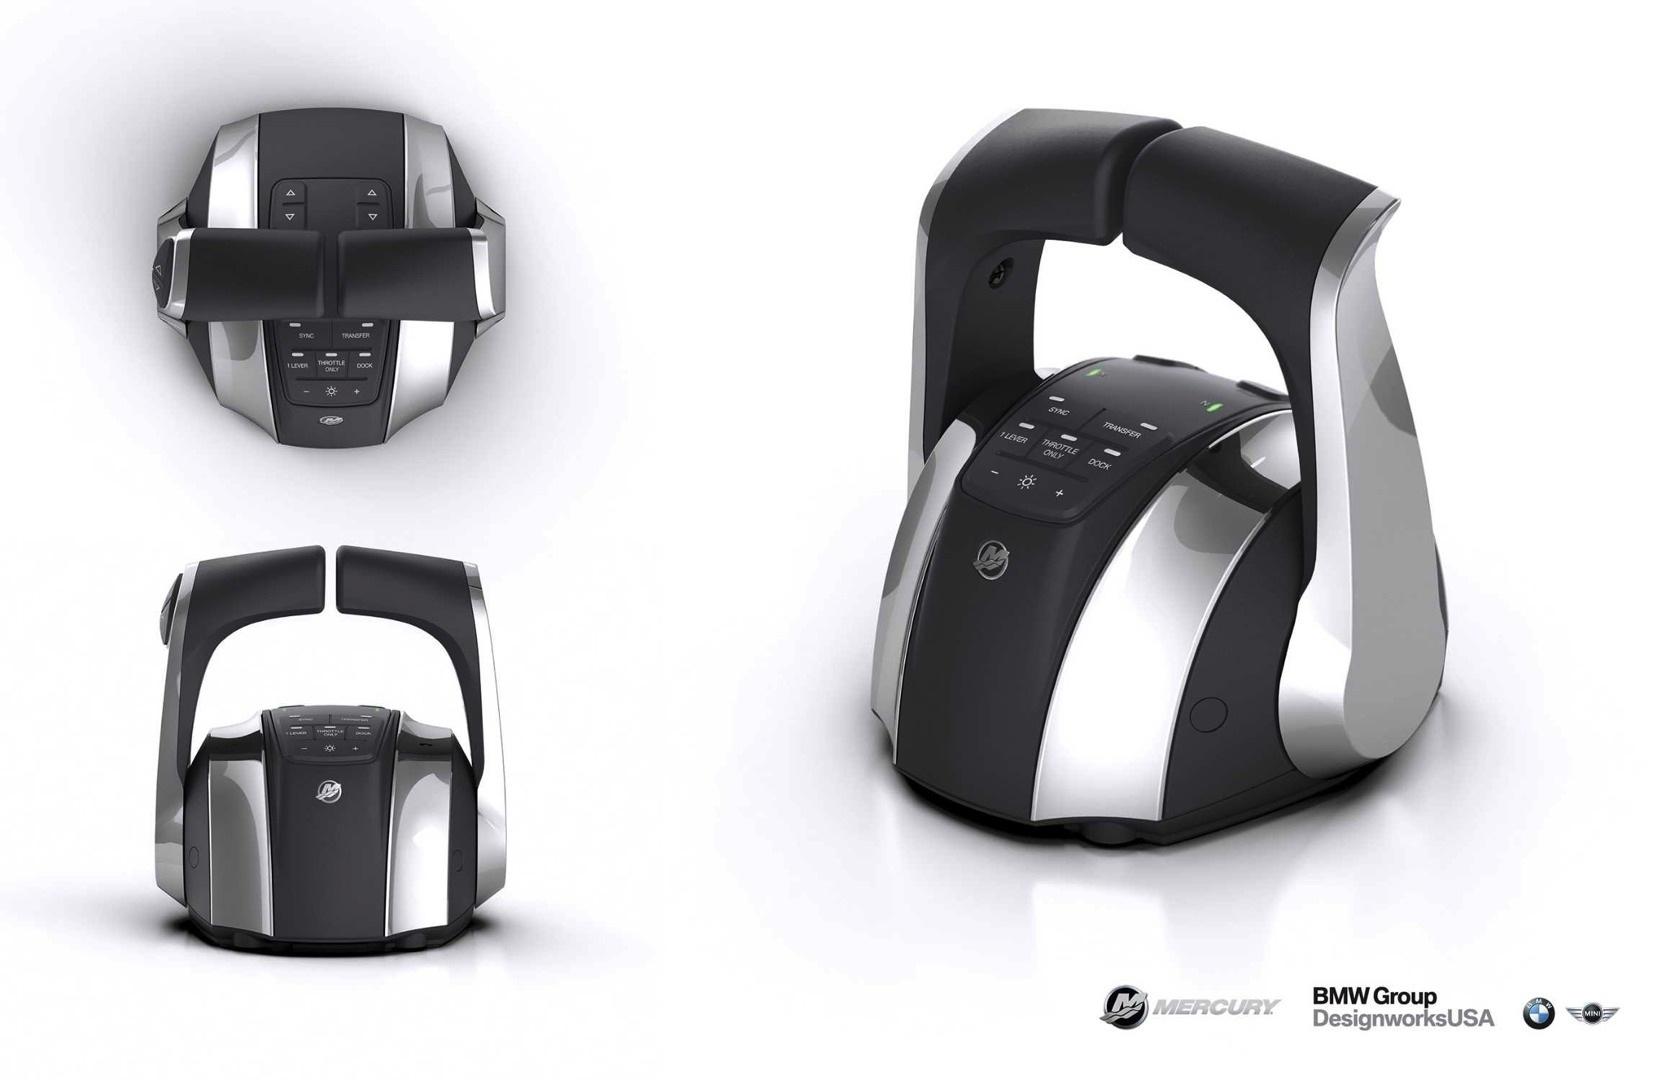 mercury marine electronic remote control designed by bmw group designworksusa. Black Bedroom Furniture Sets. Home Design Ideas